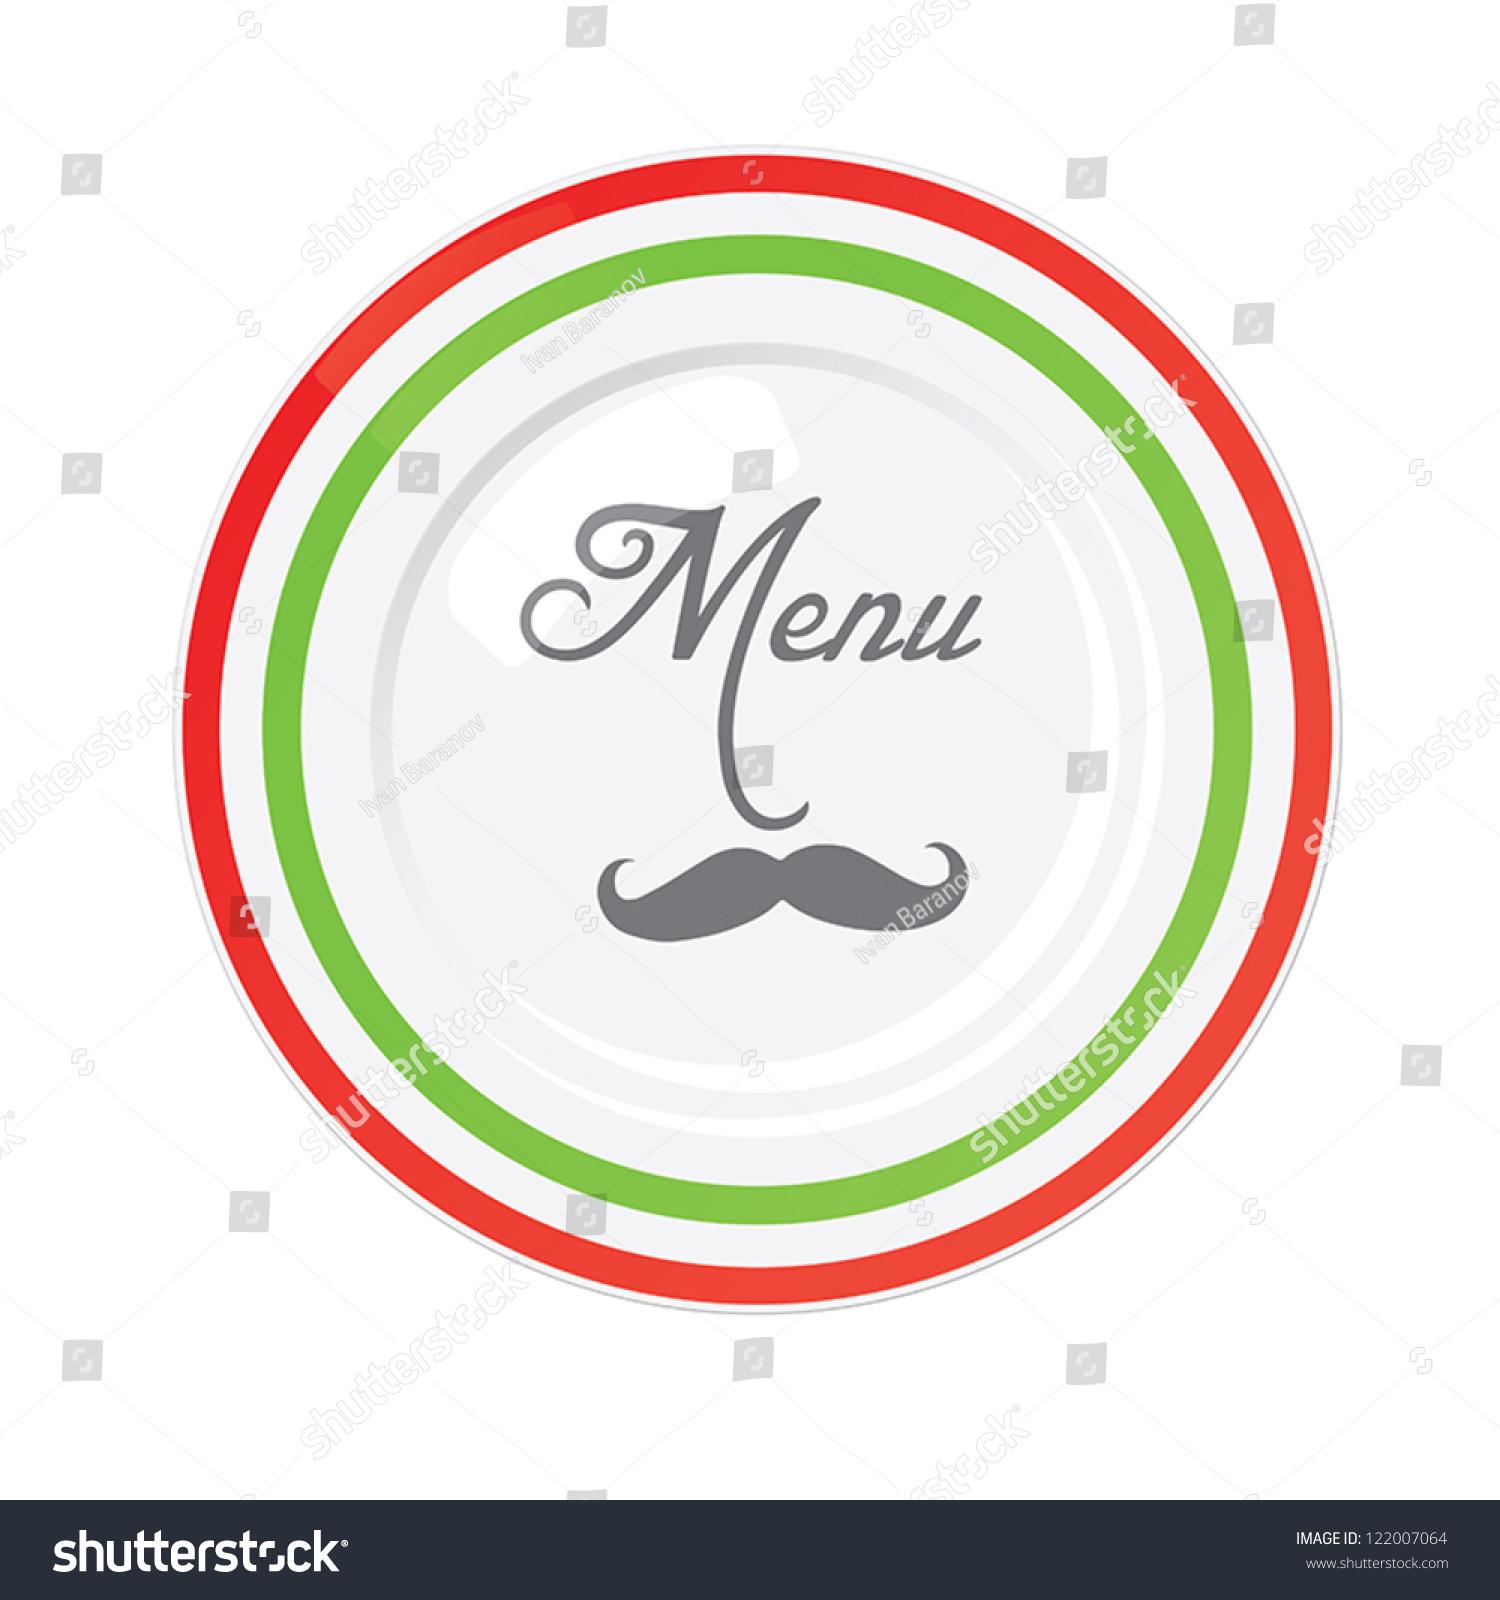 Italian Restaurant Logo With Flag: Funny Italian Restaurant Menu Design Template With Italian